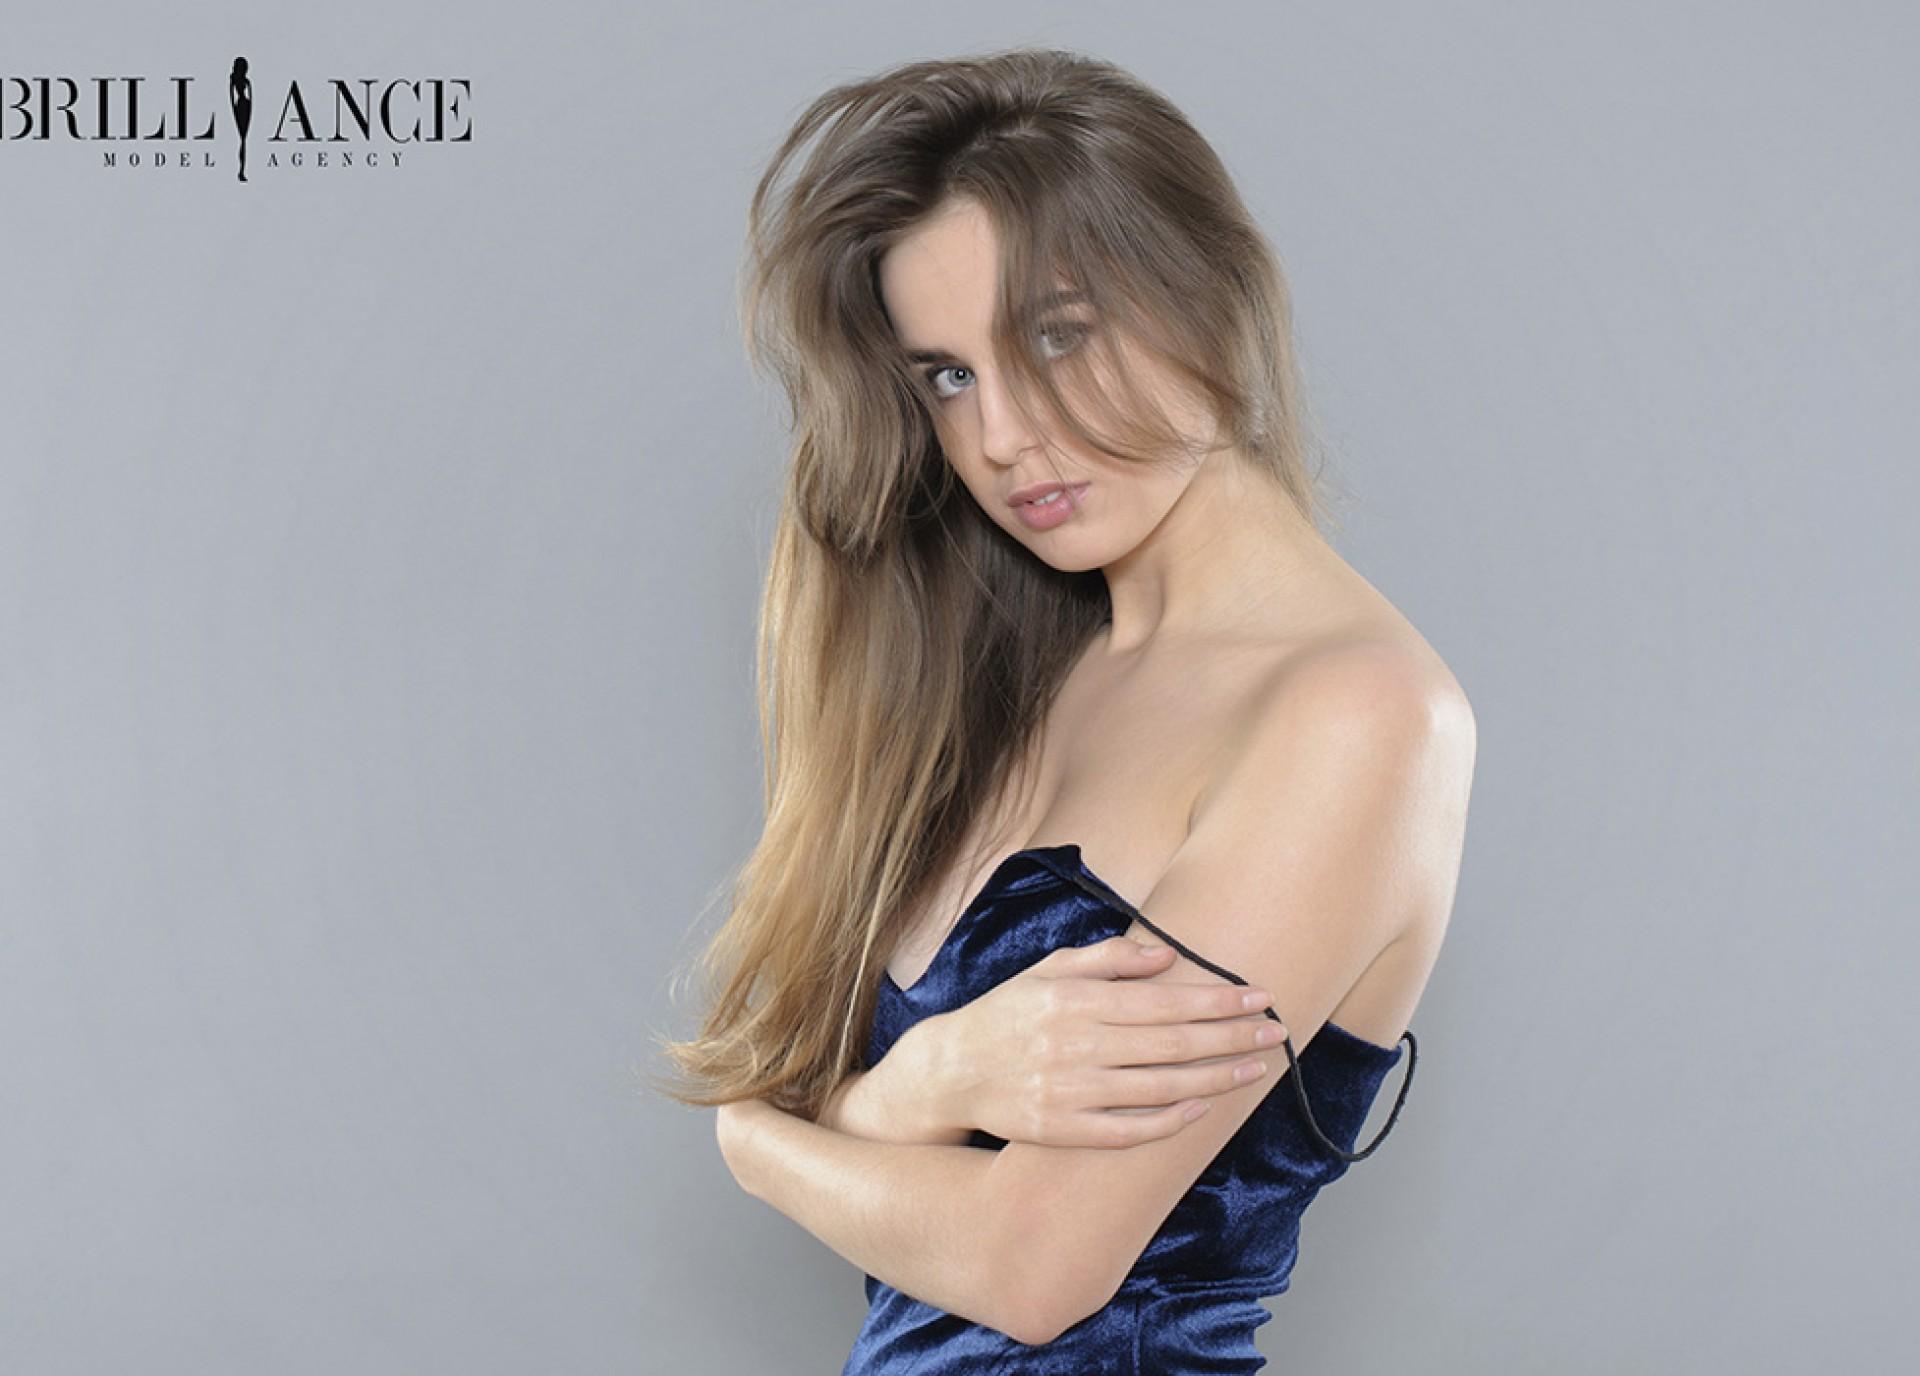 Jana 170 cm, 54 kg, 23 years | Brilliance Model Agency